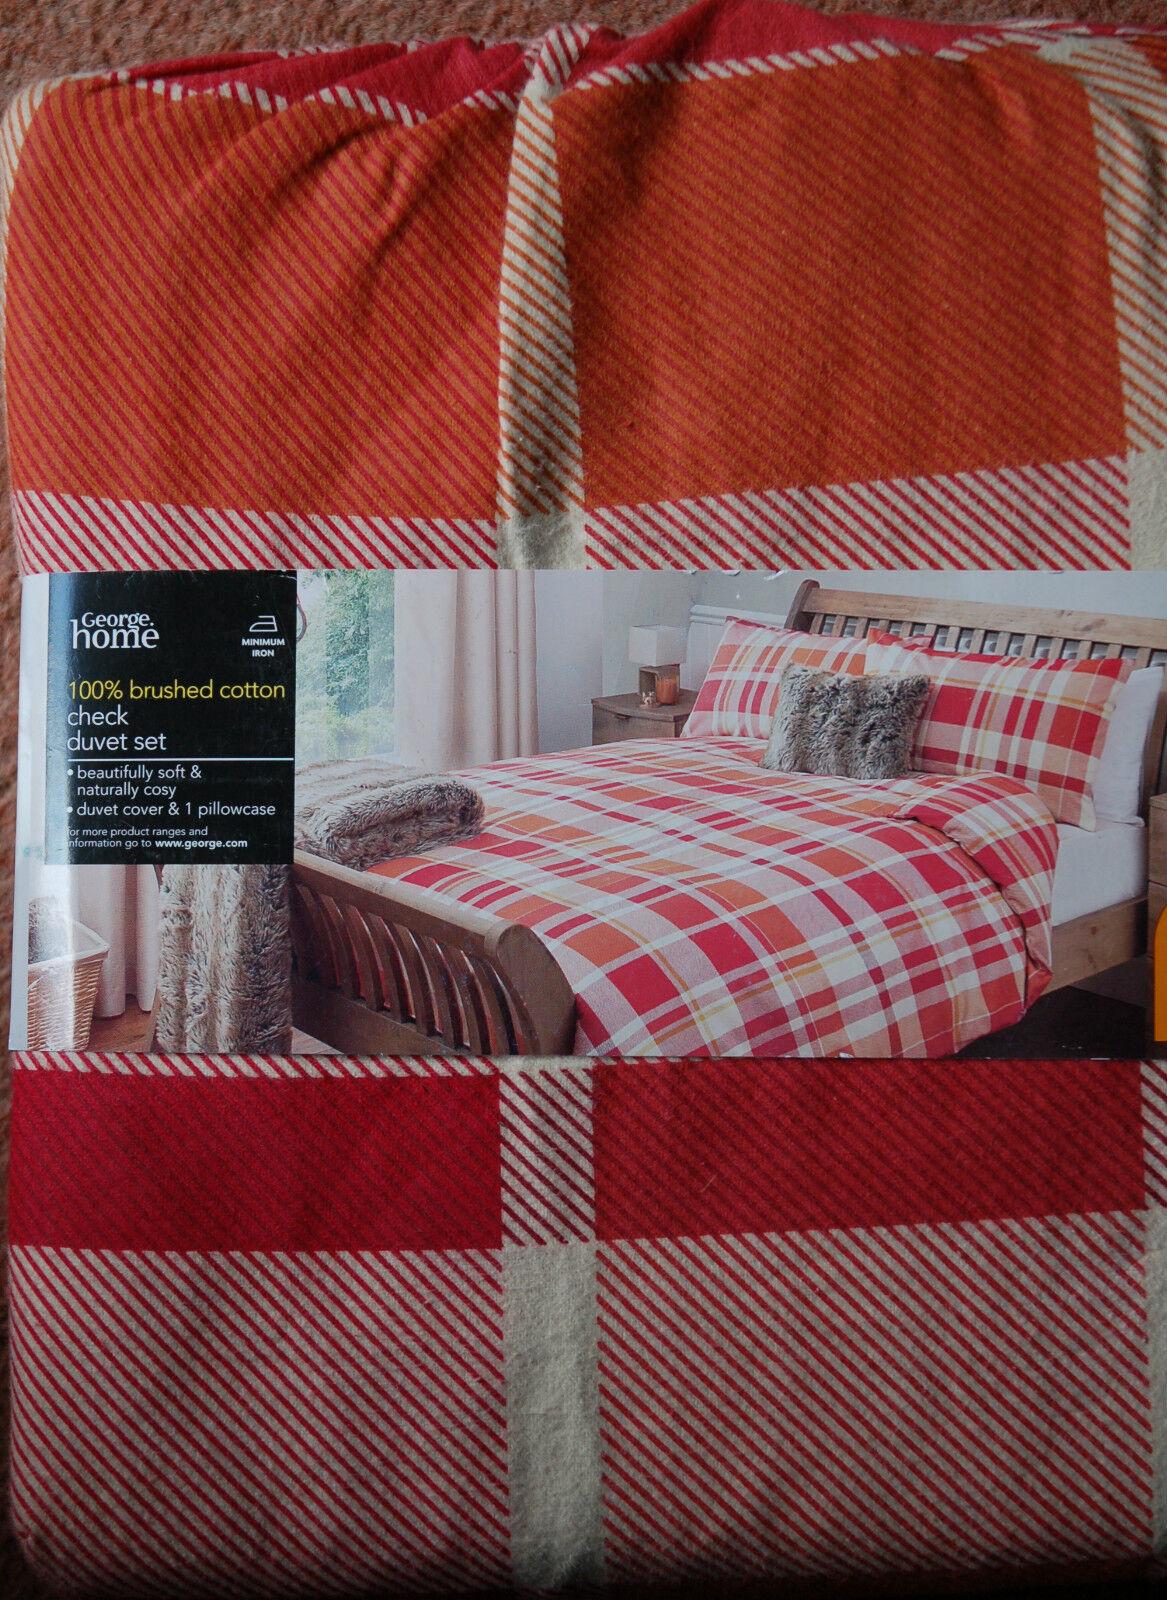 NEW Single Brushed Cotton Flannelette Duvet cover Dark Beige Warm